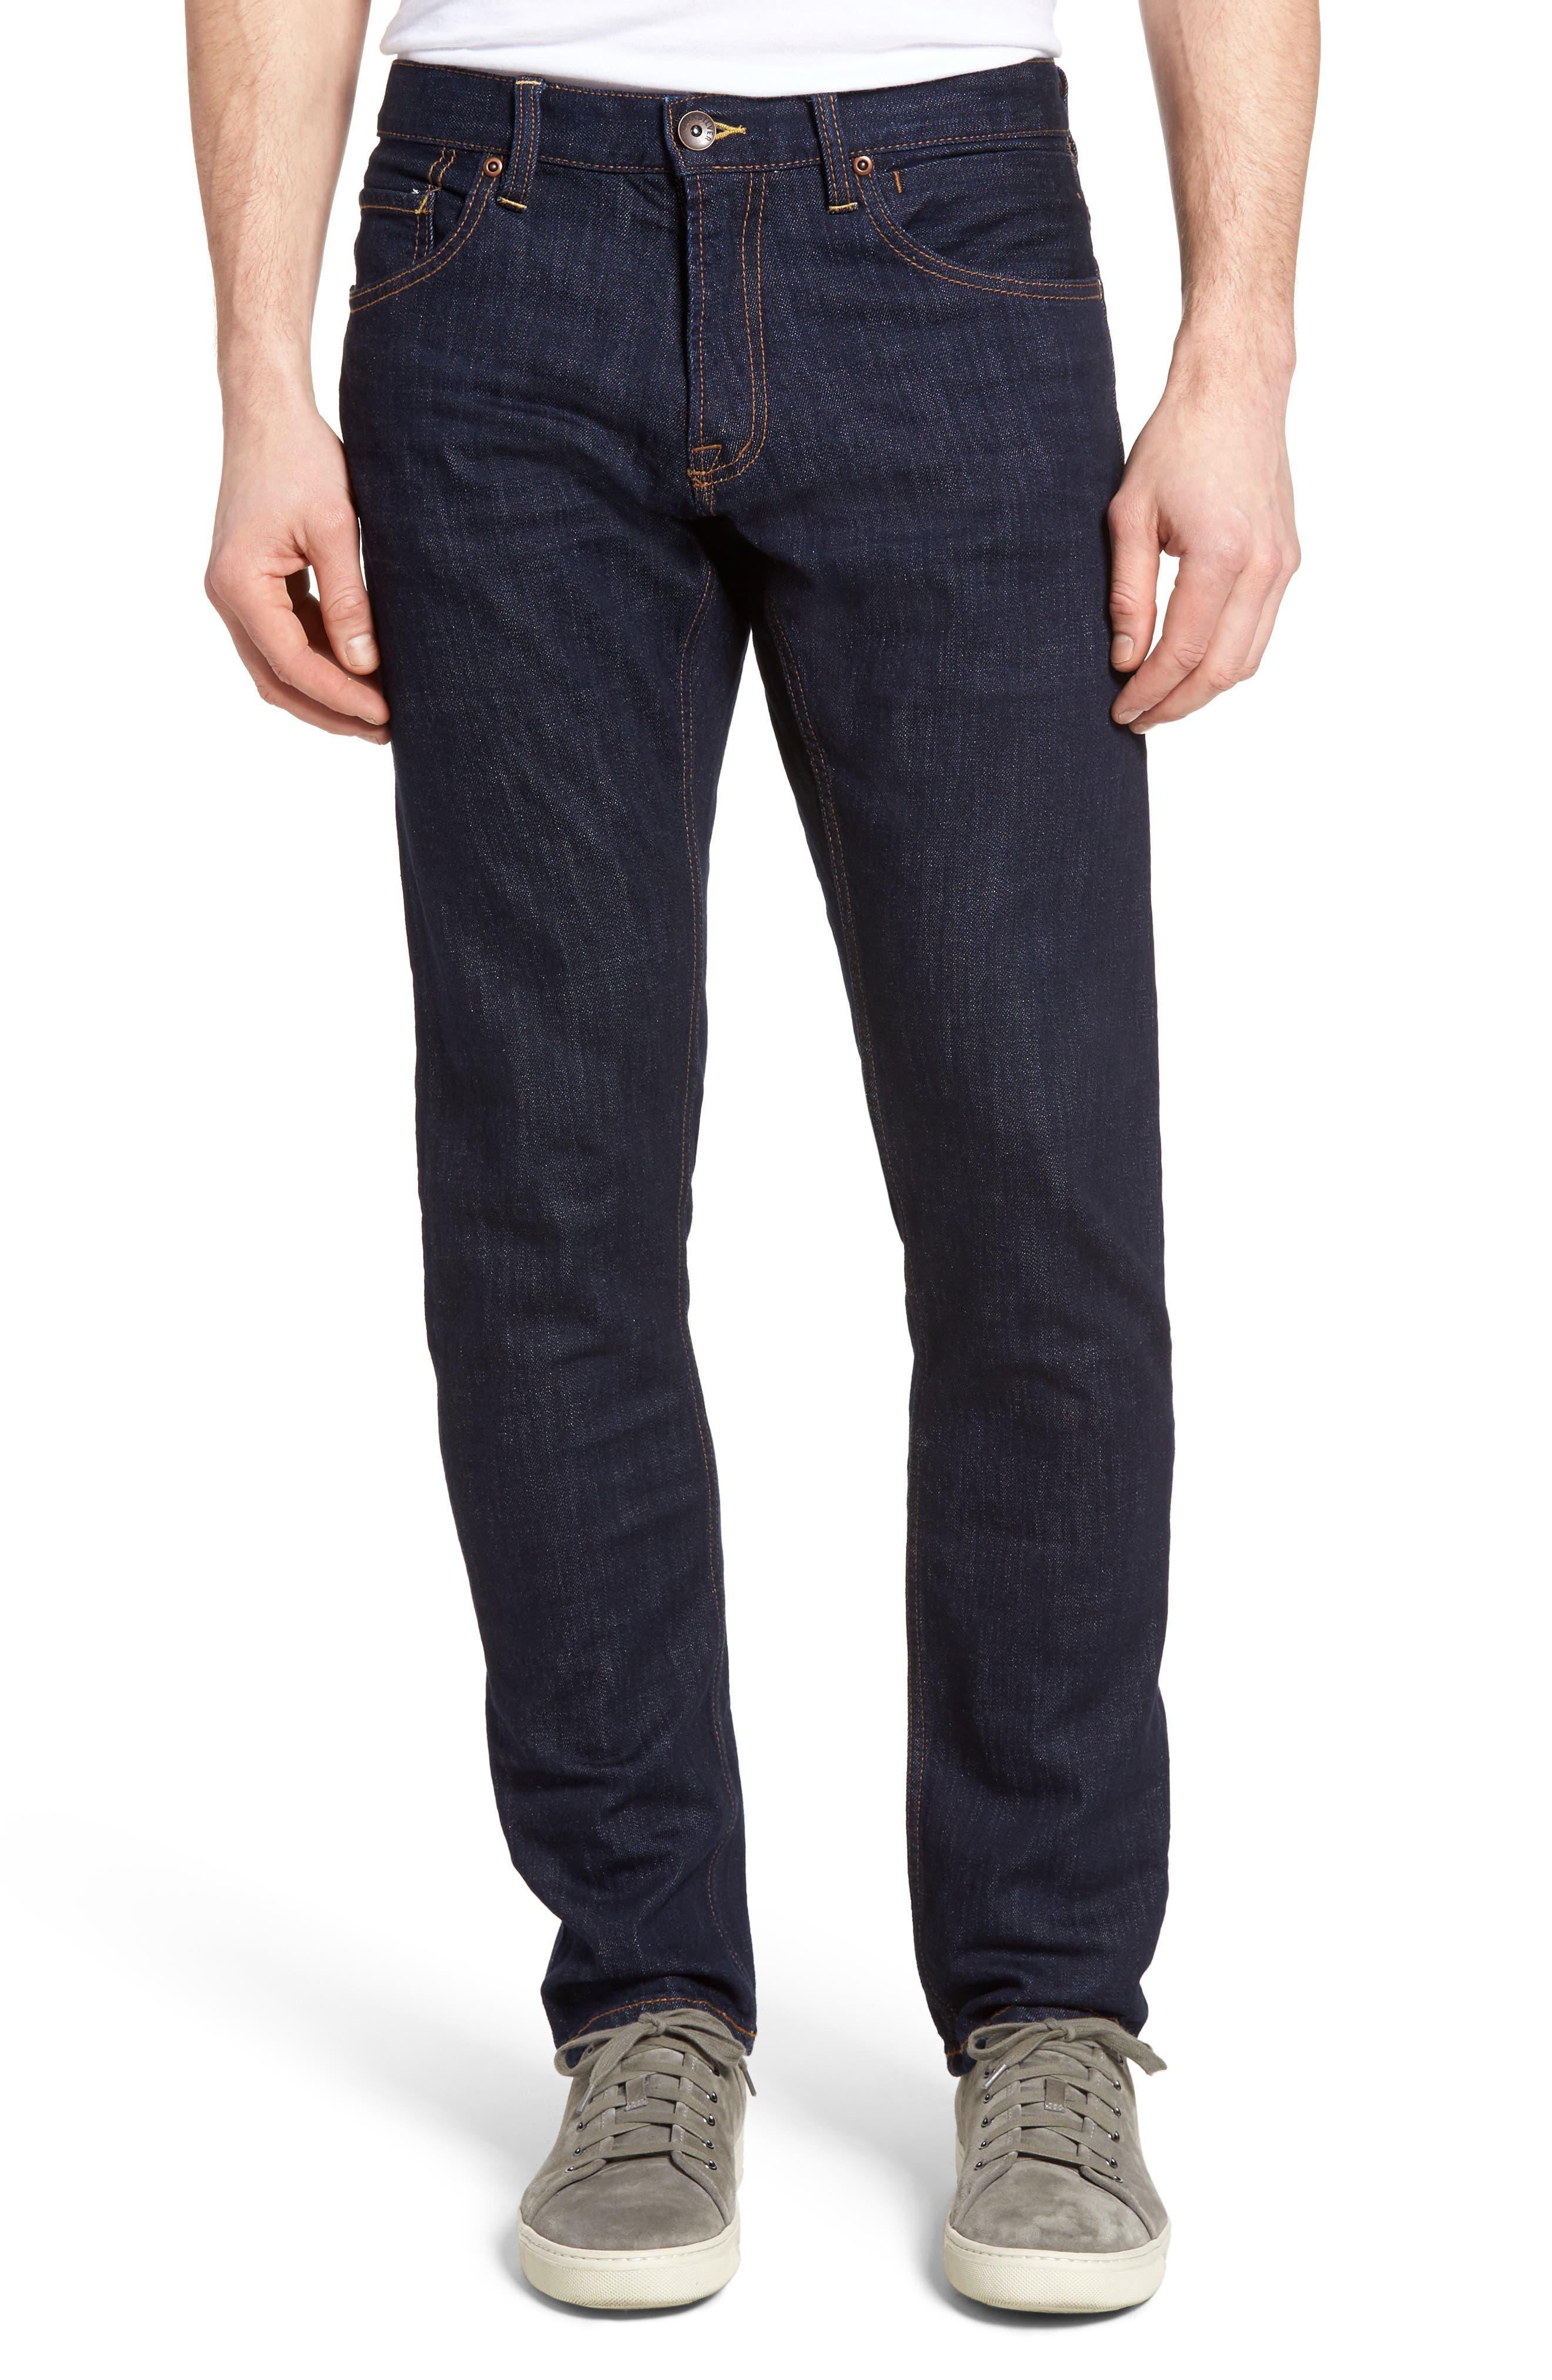 QUIKSILVER Revolver Slim Fit Jeans